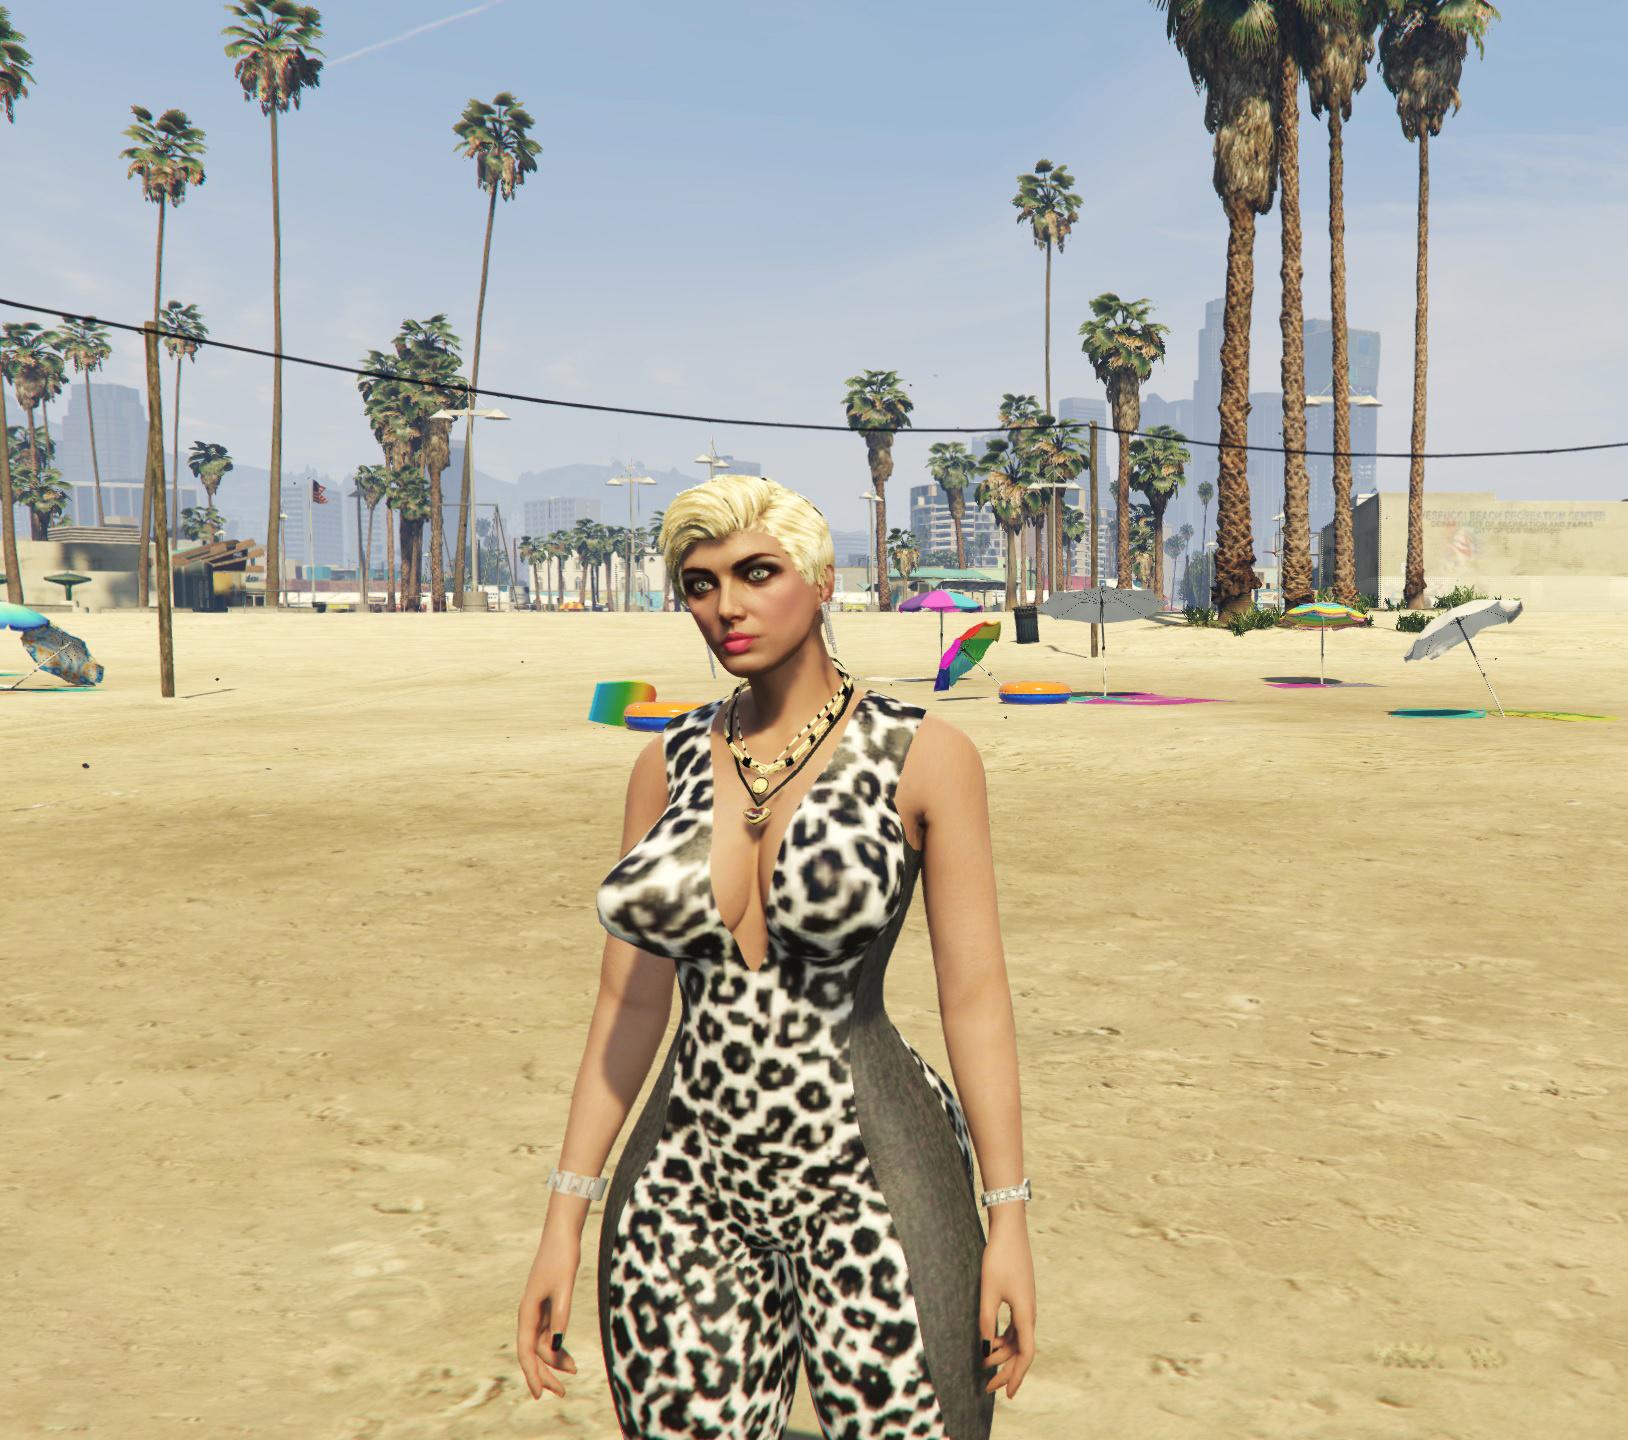 Mp female - New full body 1.0 - GTA 5 Mod | Grand Theft